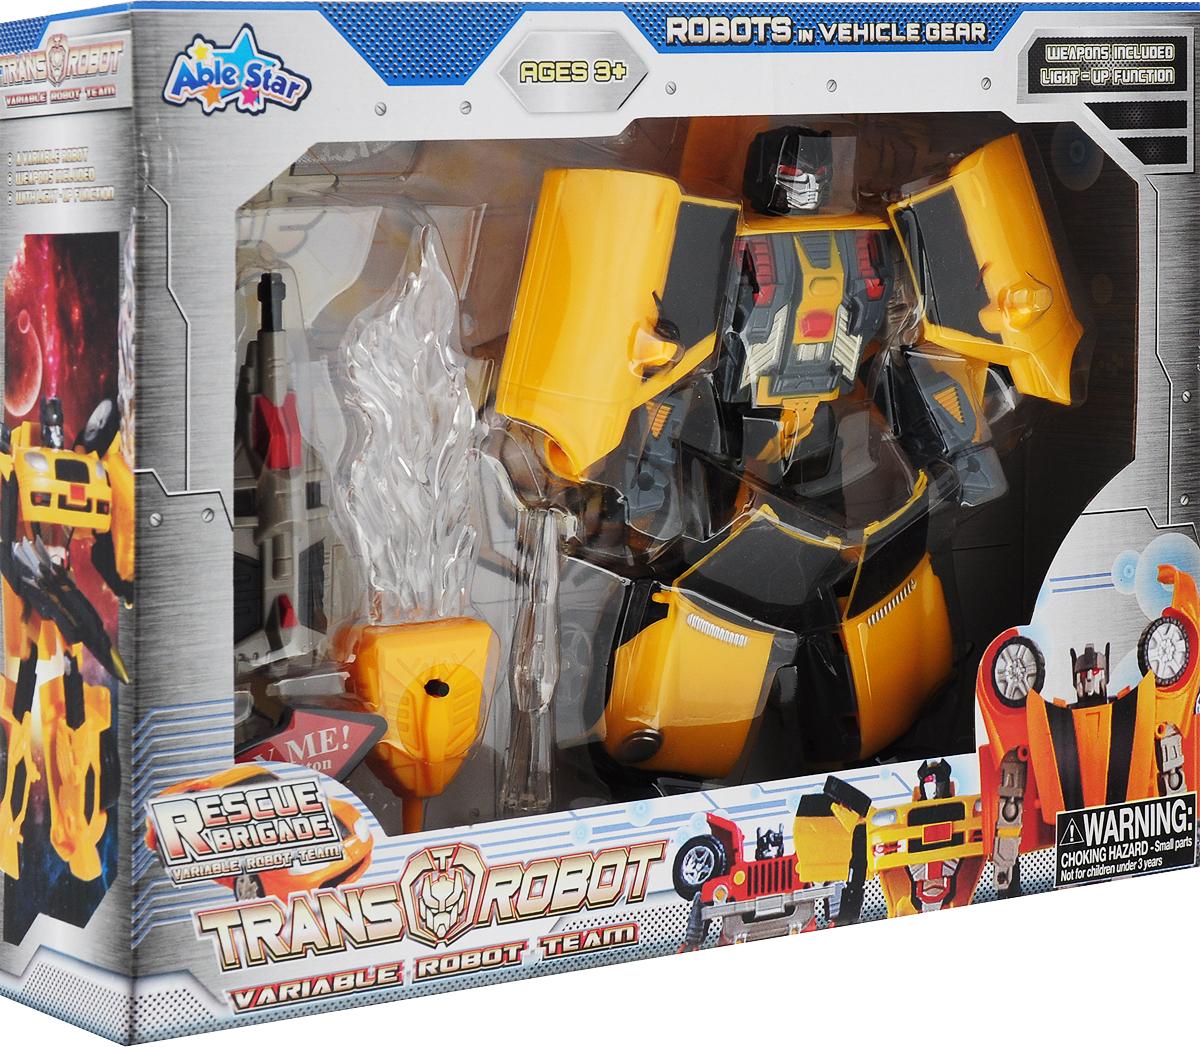 Робот-трансформер Able Star, 78115, цвет желтый yako робот трансформер цвет желтый зеленый